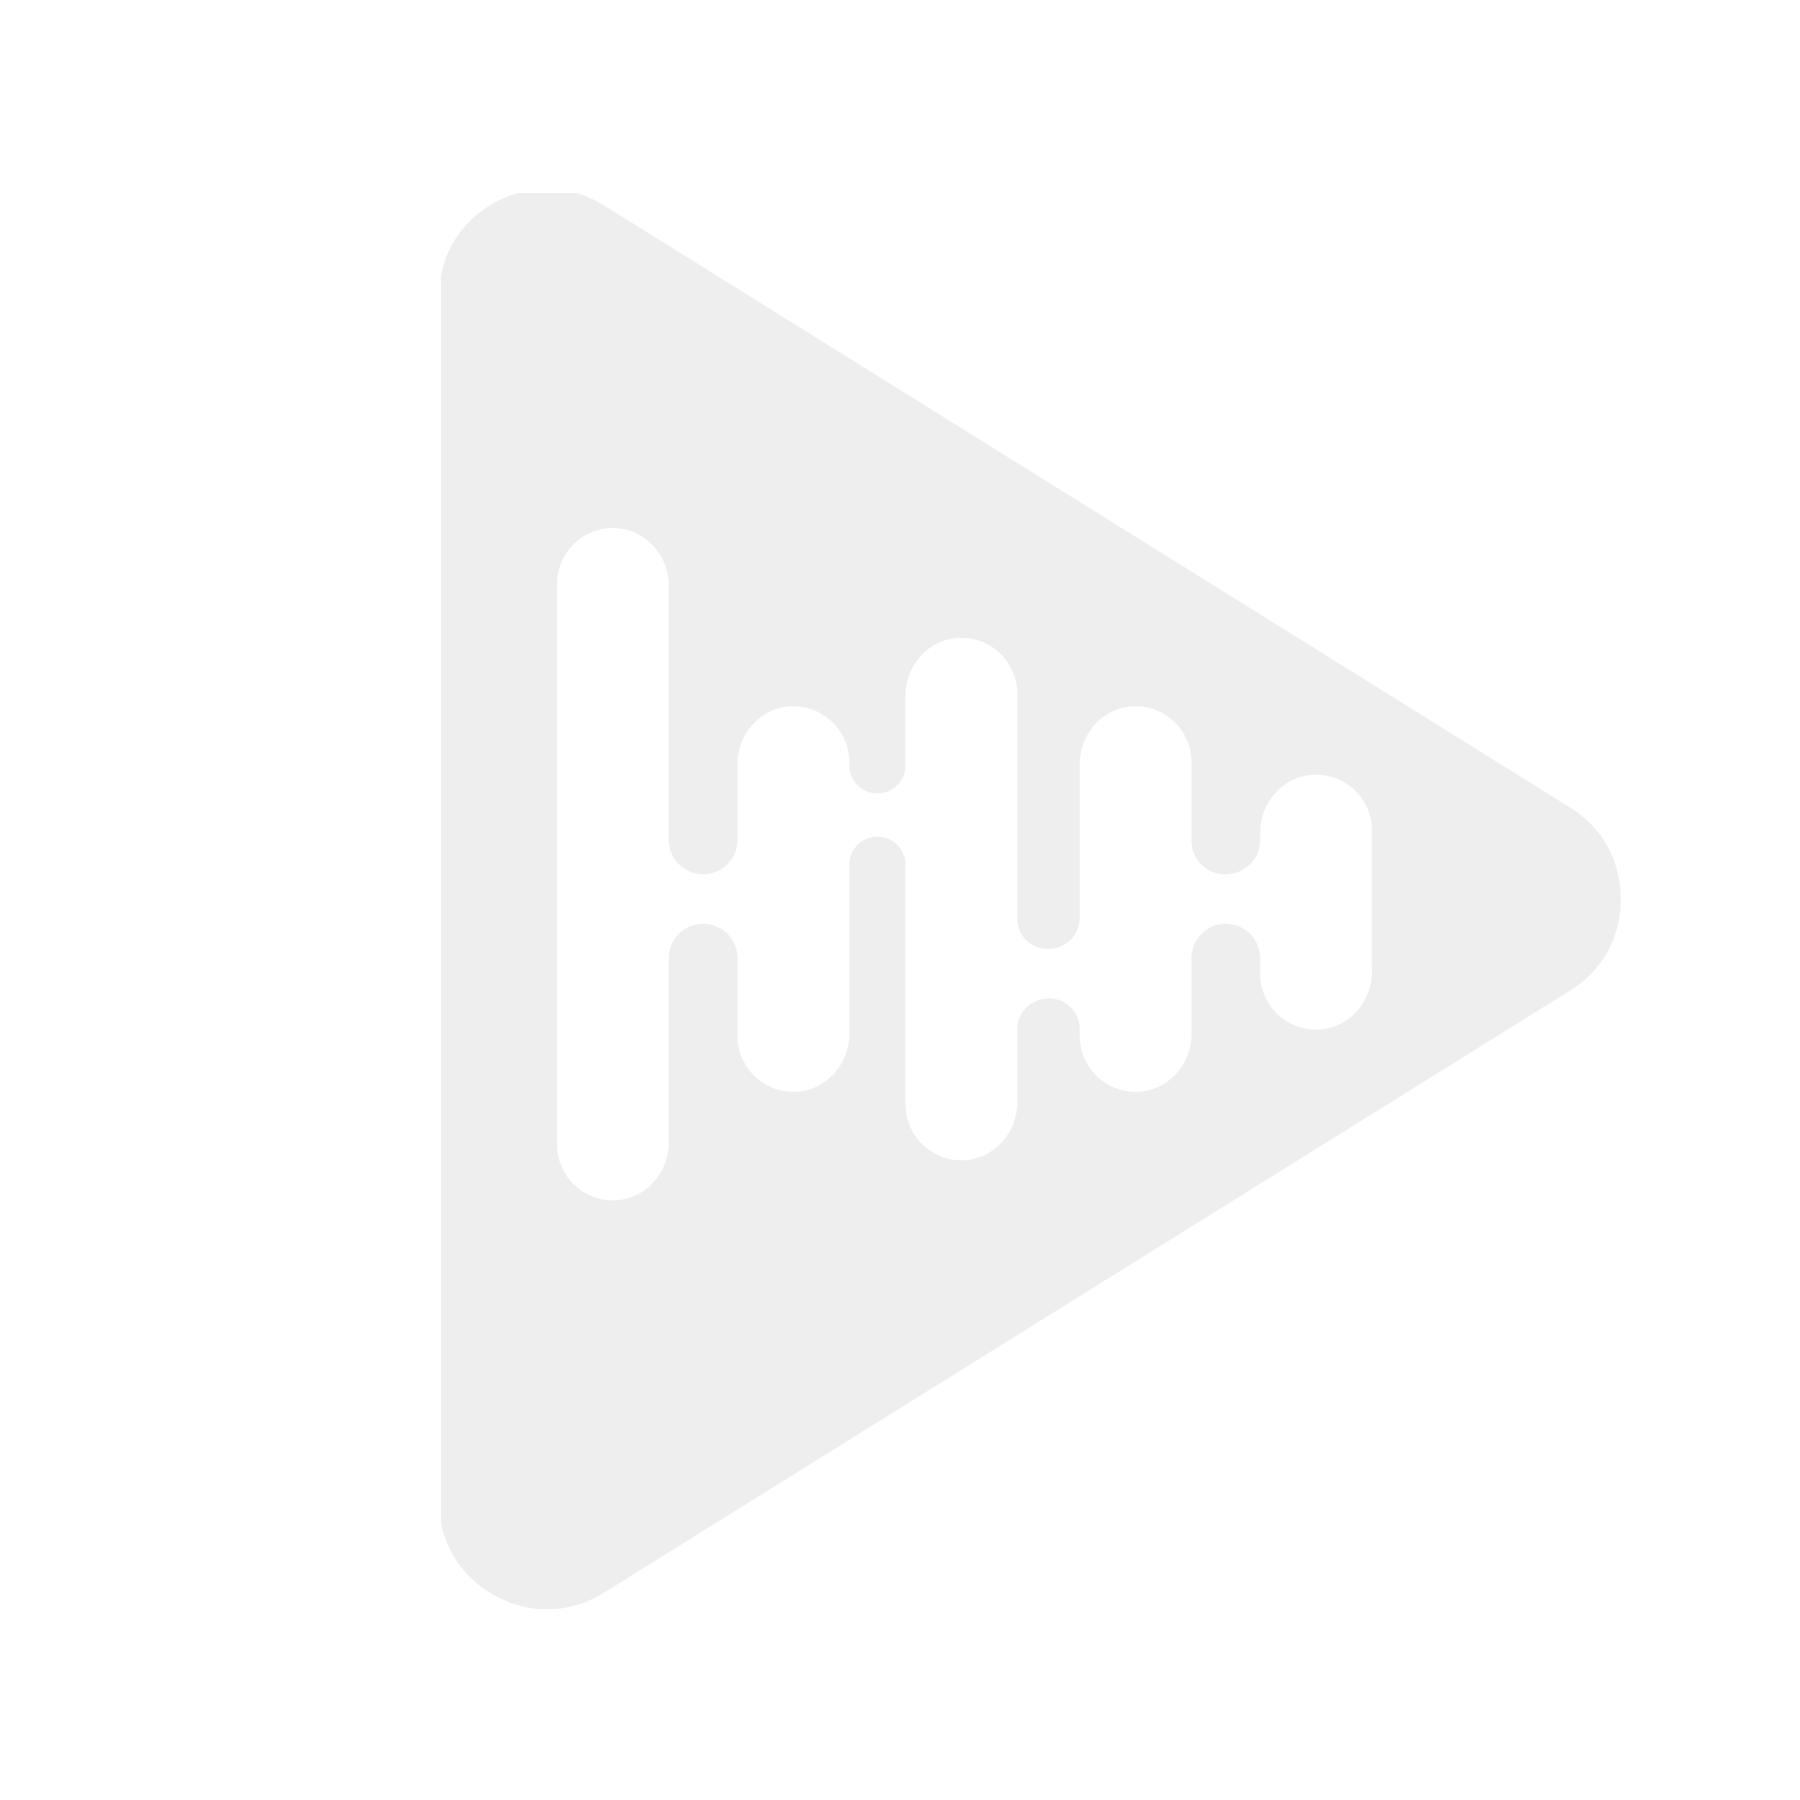 Skoddejuice Banana Aroma